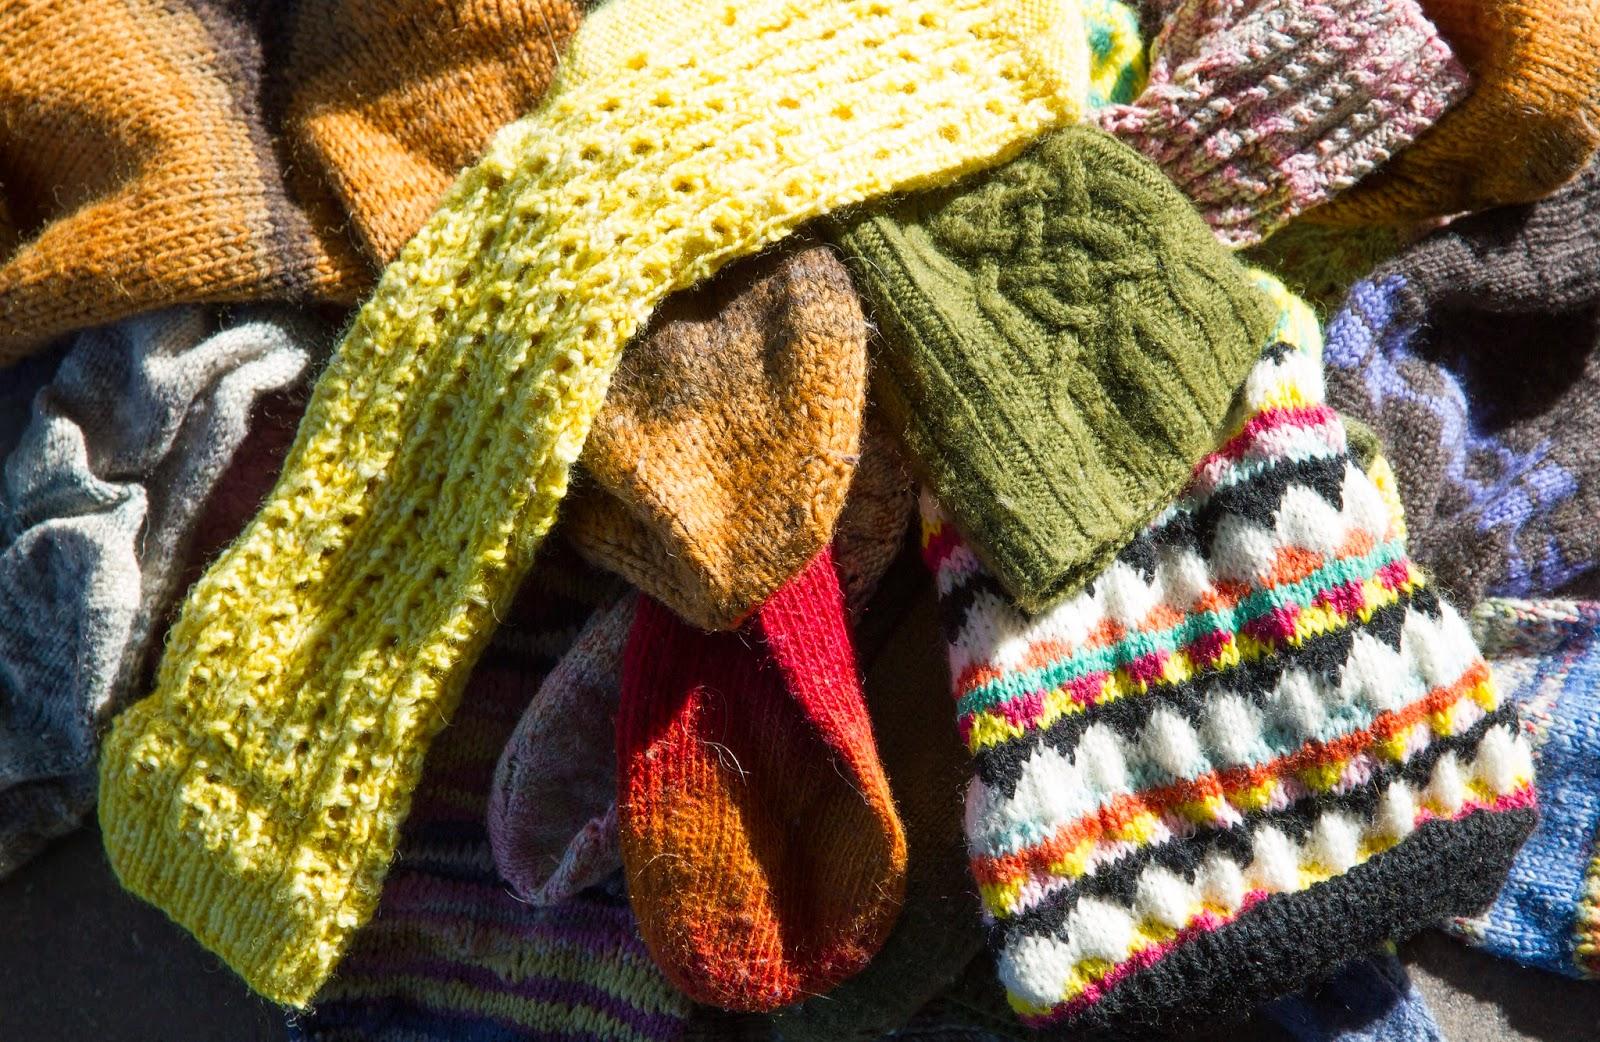 a pile of handknitted socks, www.bykaae.dk